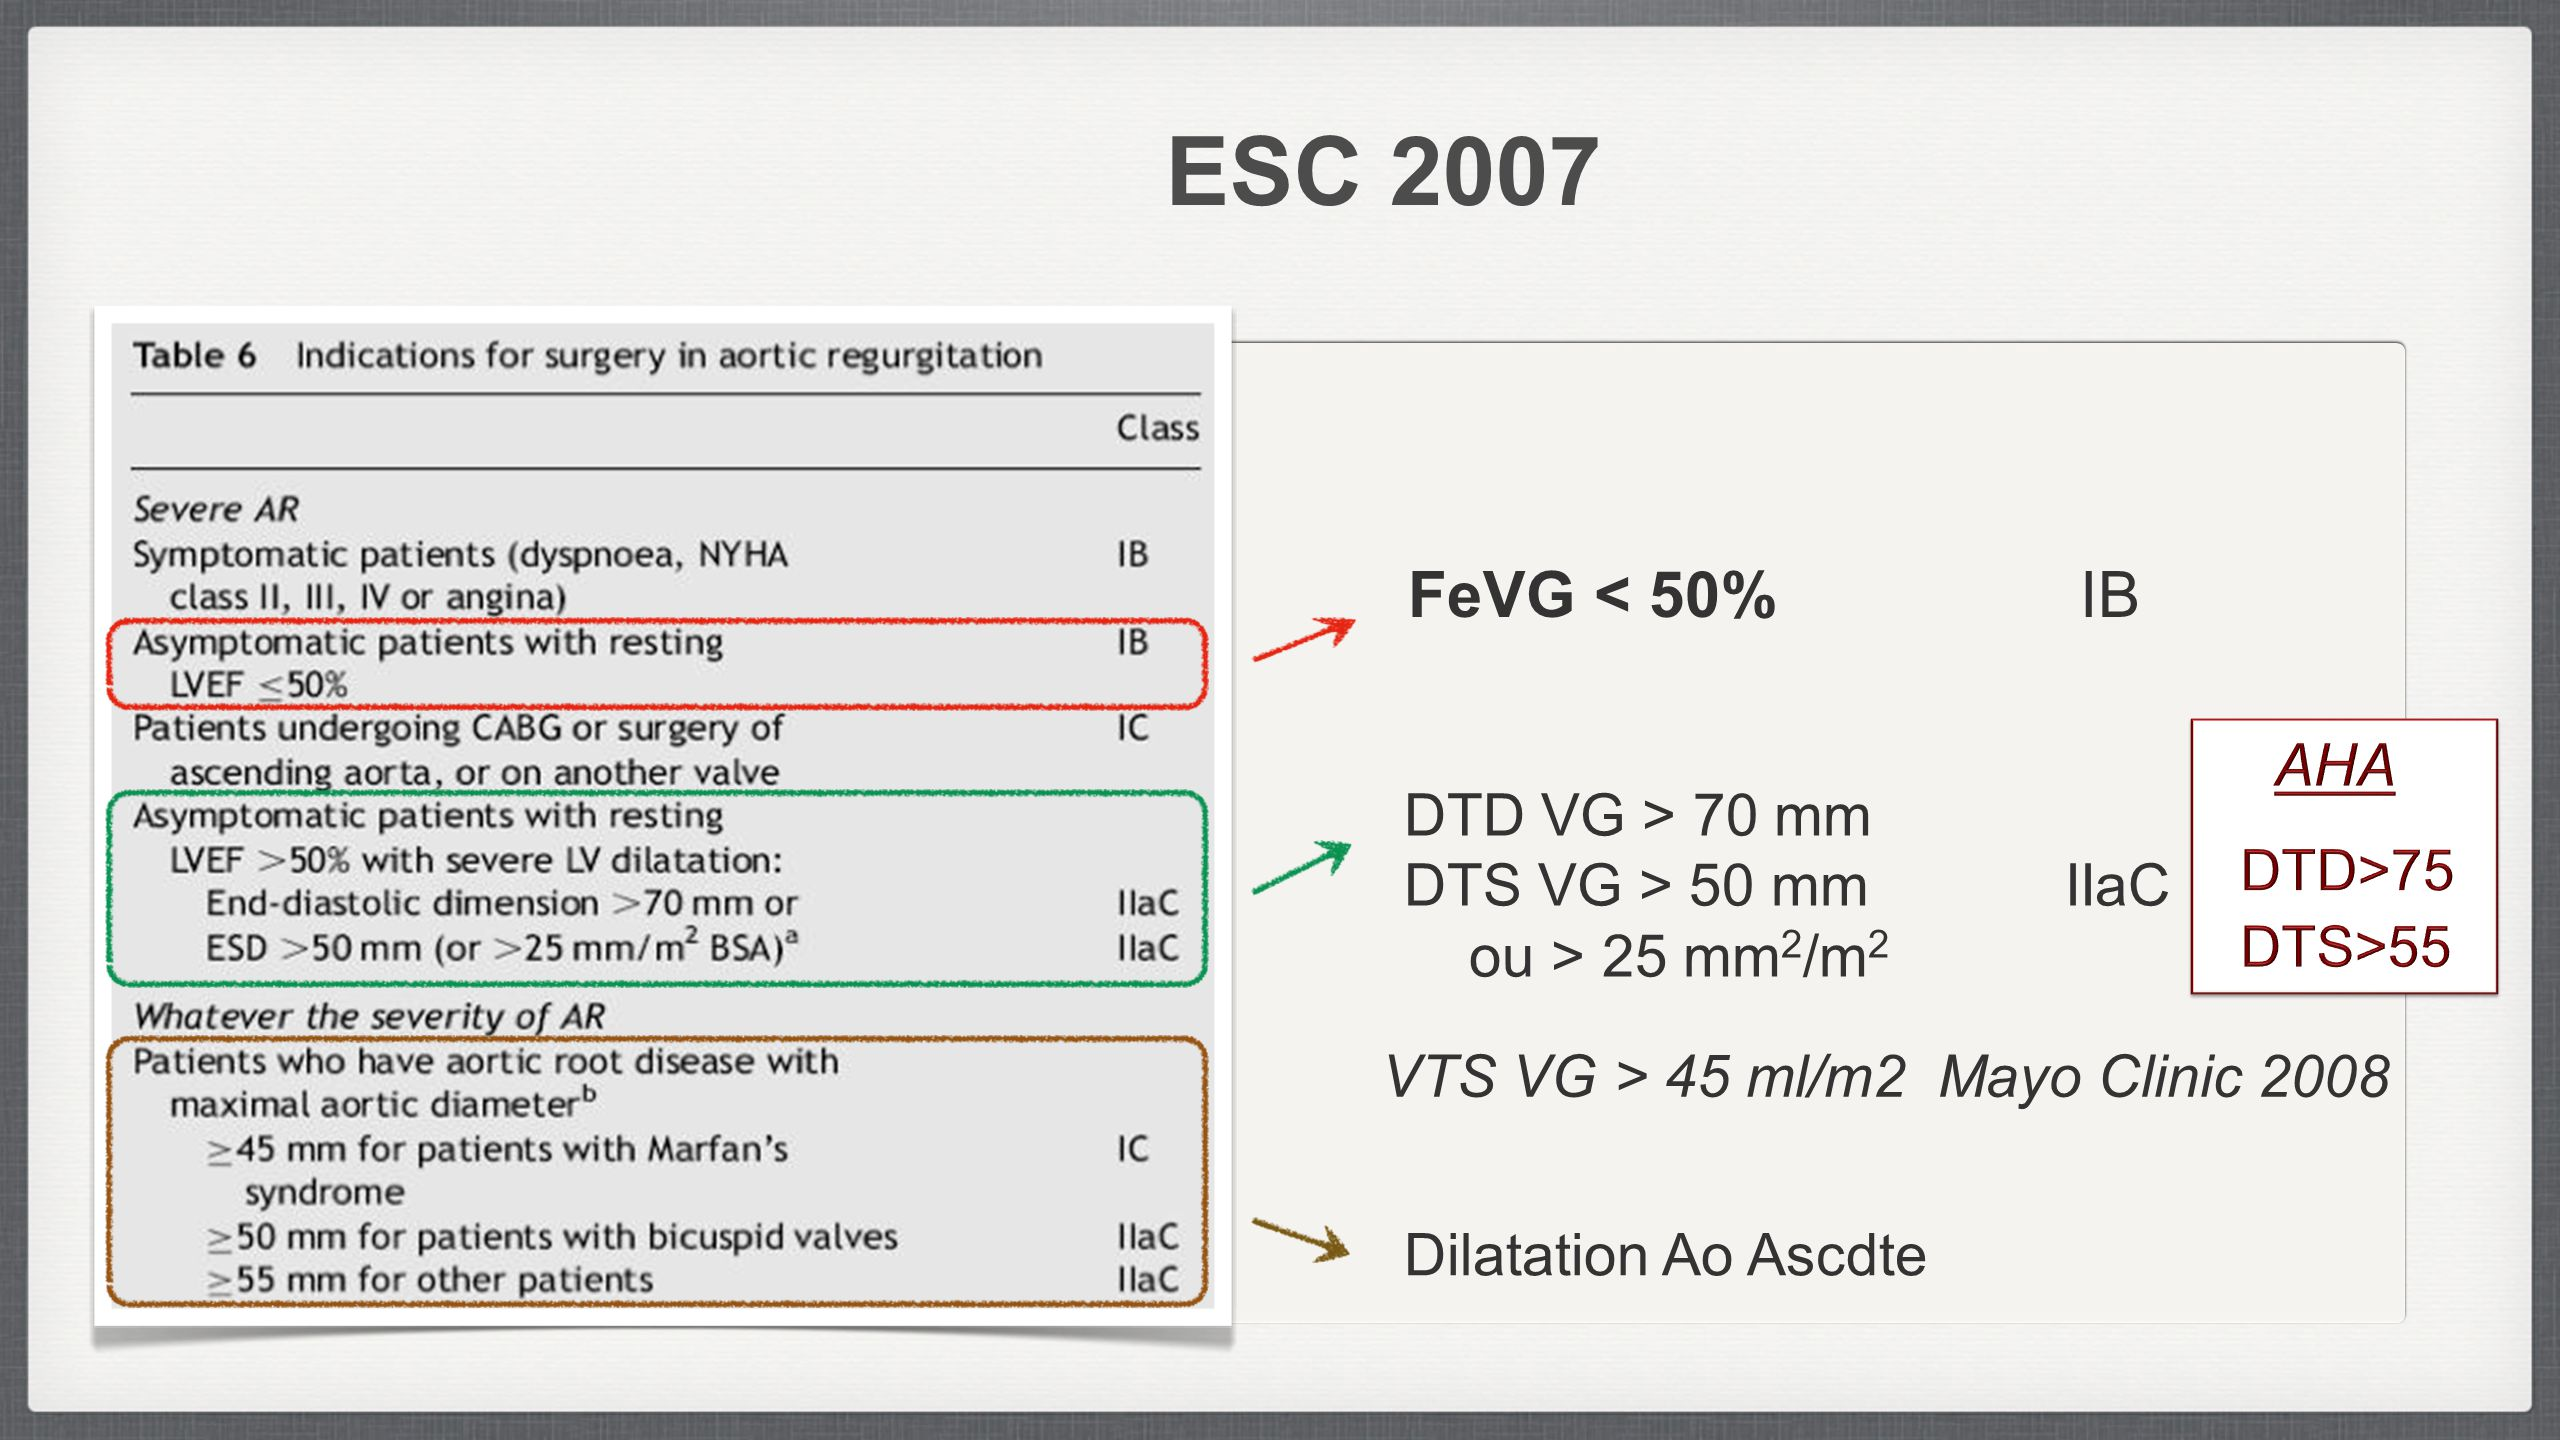 ESC 2007 FeVG < 50% IB DTD VG > 70 mm DTS VG > 50 mm IIaC ou > 25 mm 2 /m 2 Dilatation Ao Ascdte VTS VG > 45 ml/m2 Mayo Clinic 2008